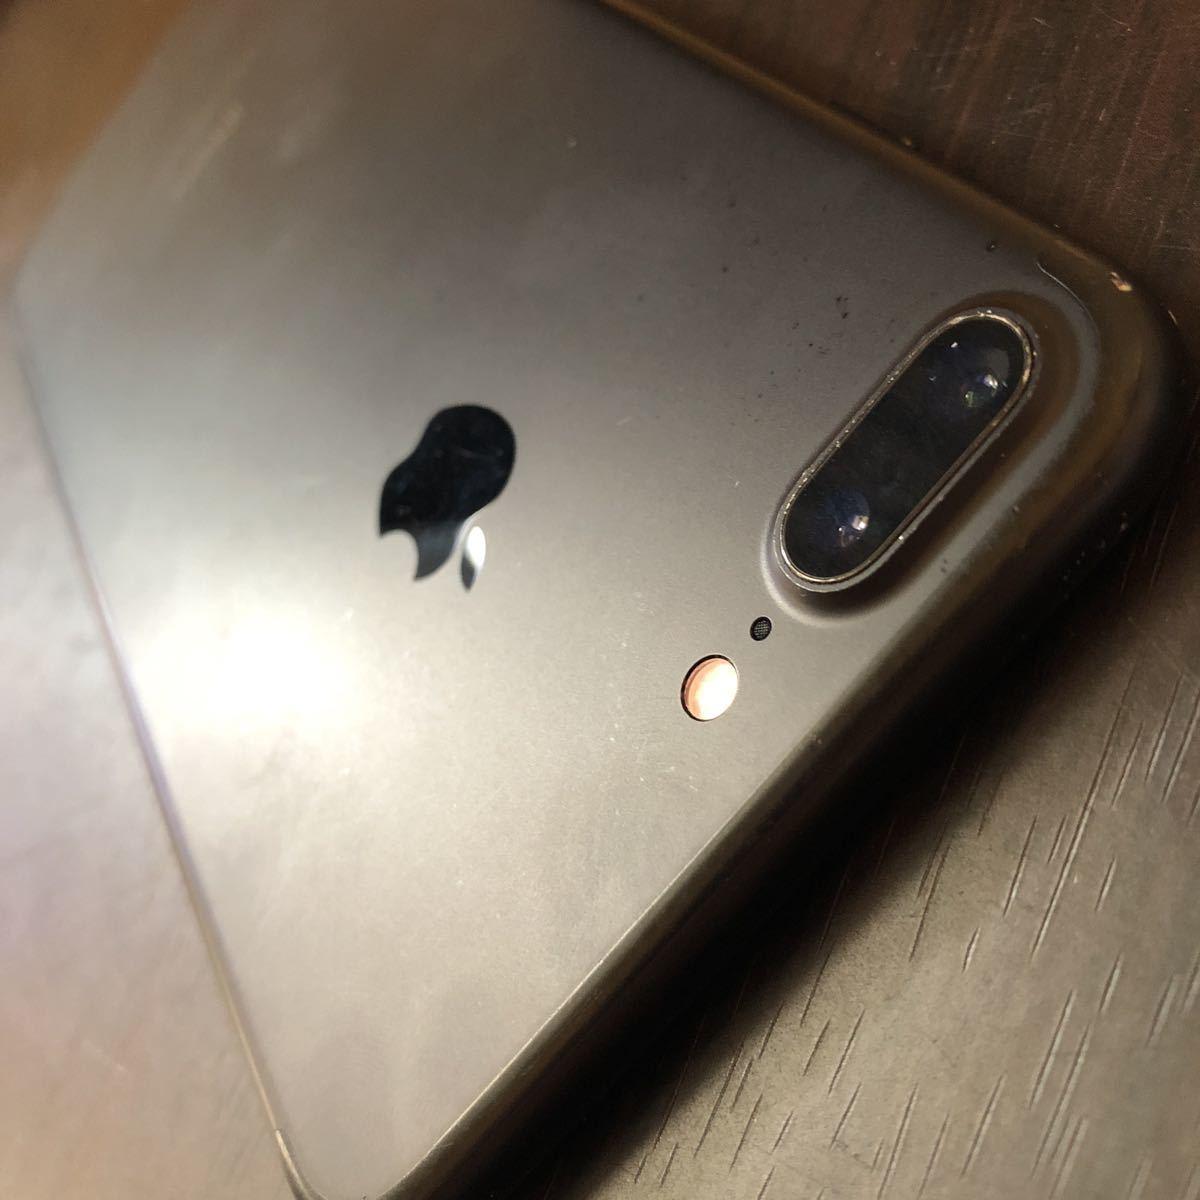 iPhone7Plus 256GB SIMフリー ブラック 中古良品 [1505]_画像6